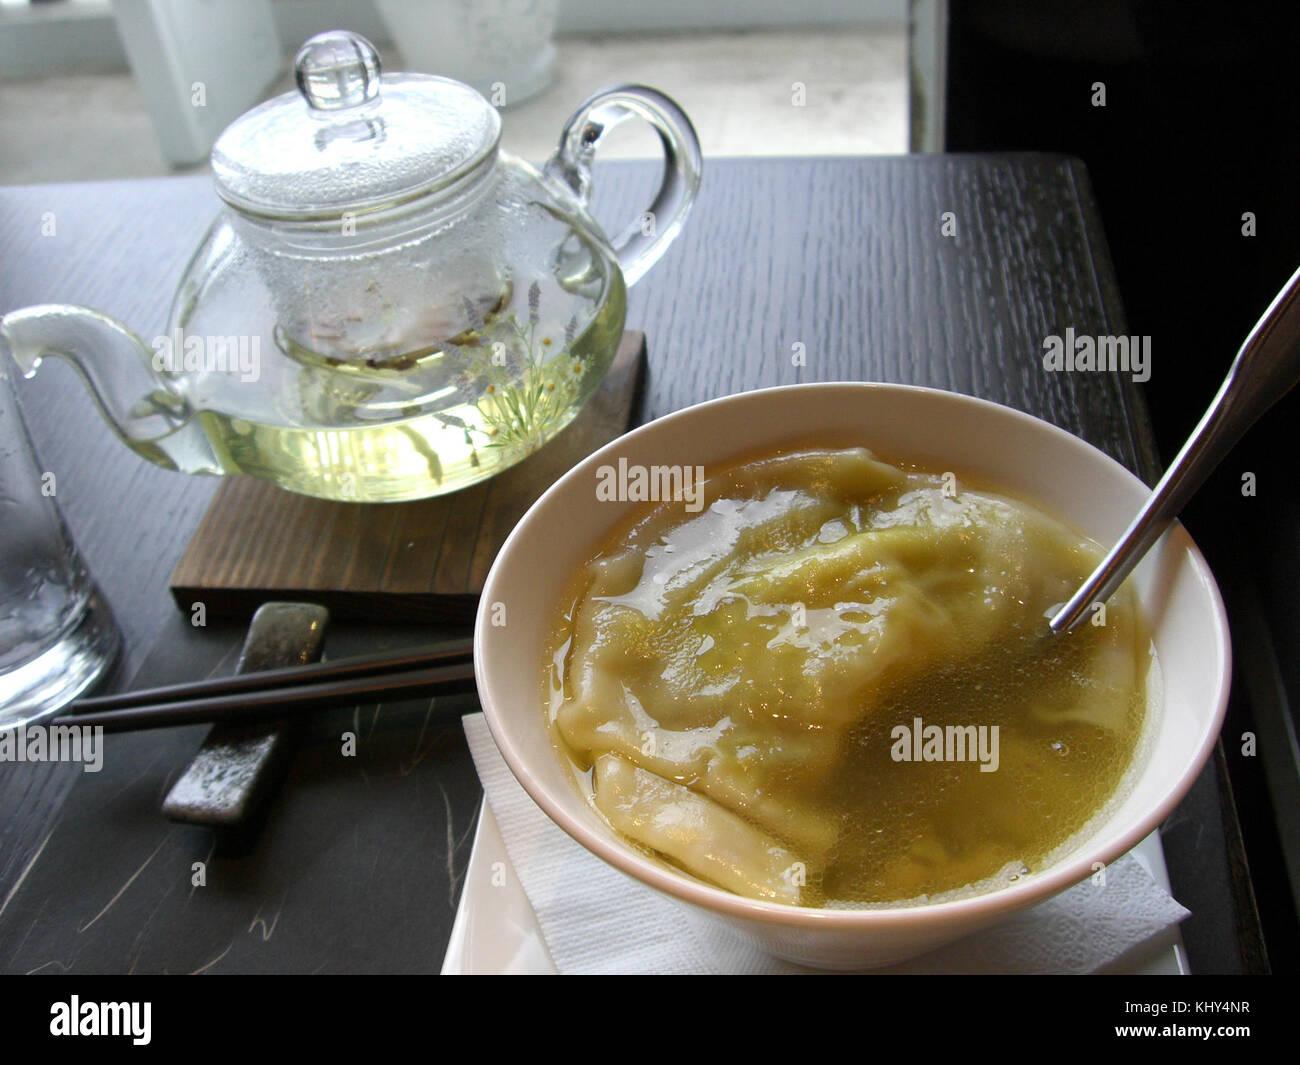 NPM Shark Fin Soup - Stock Image